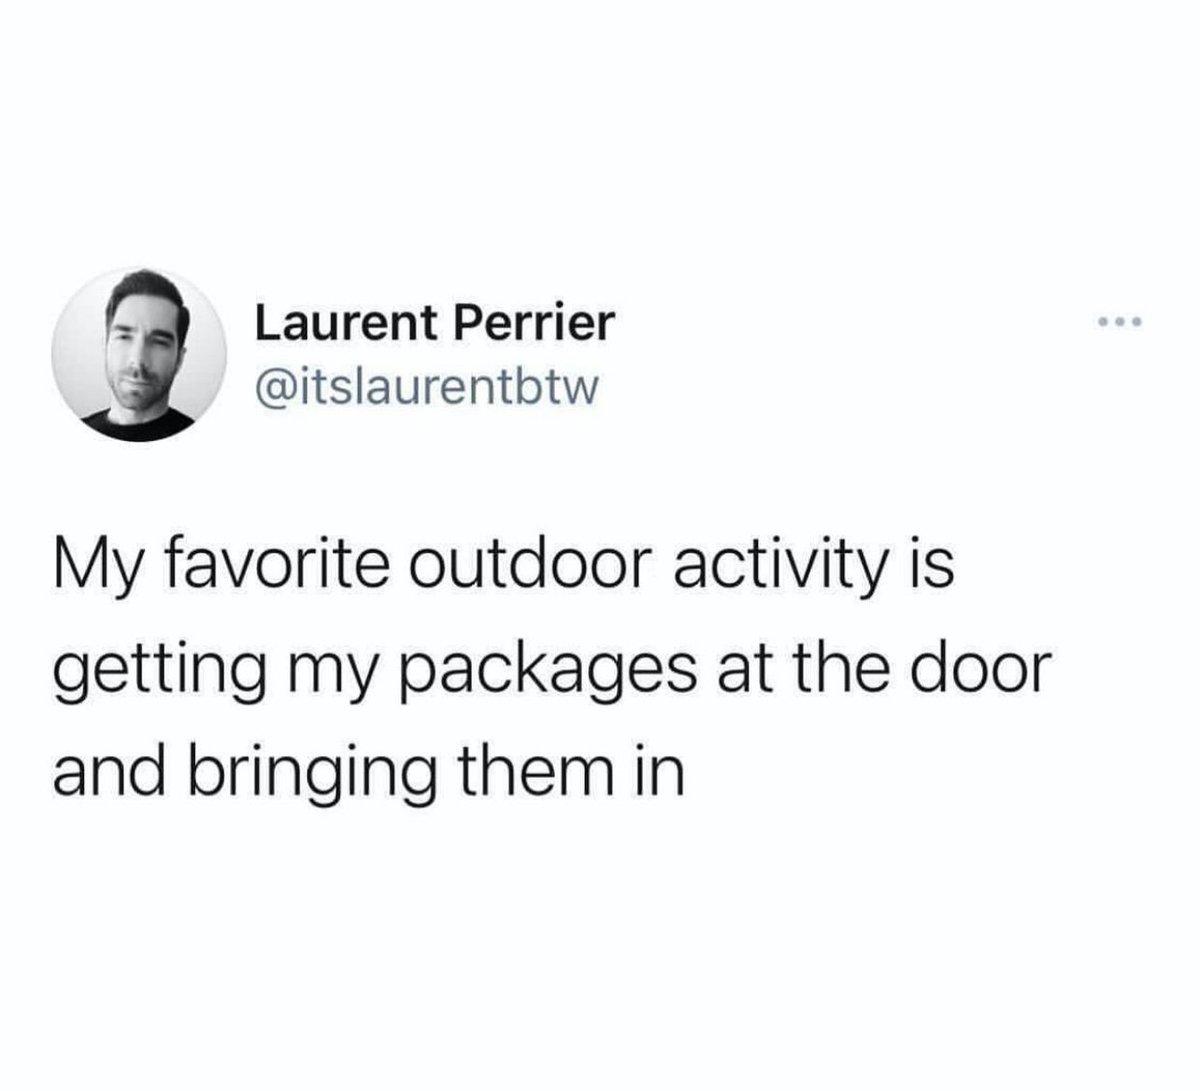 call it a hobby